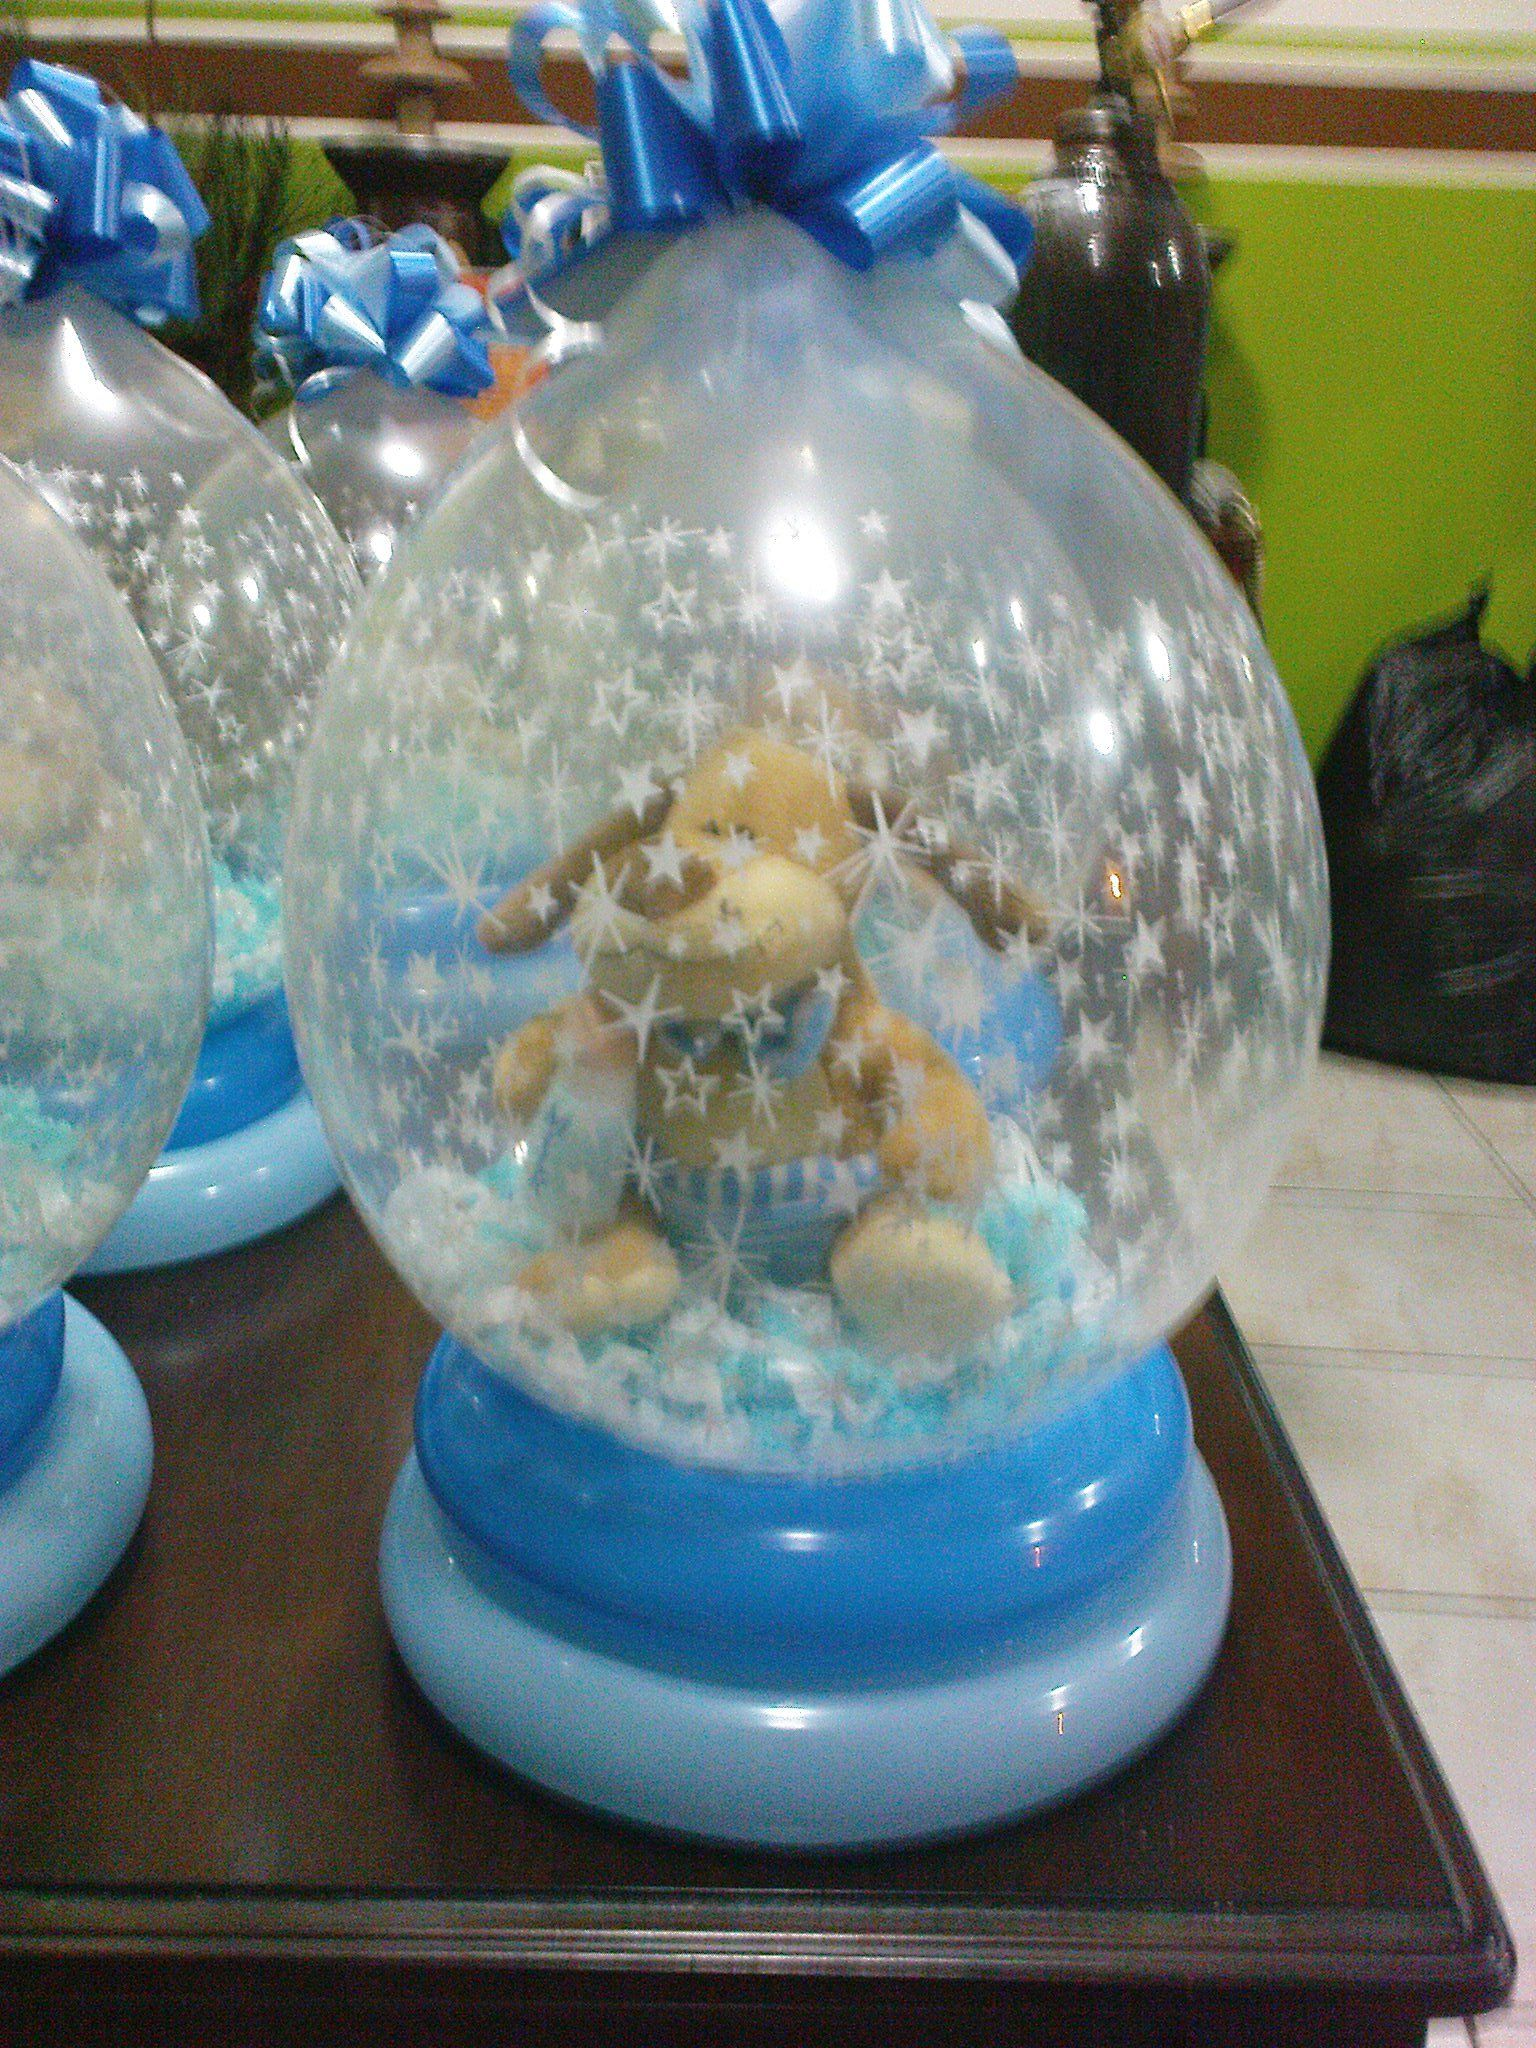 Centros de mesa para t de canastilla con globos y - Adornos centros de mesa ...